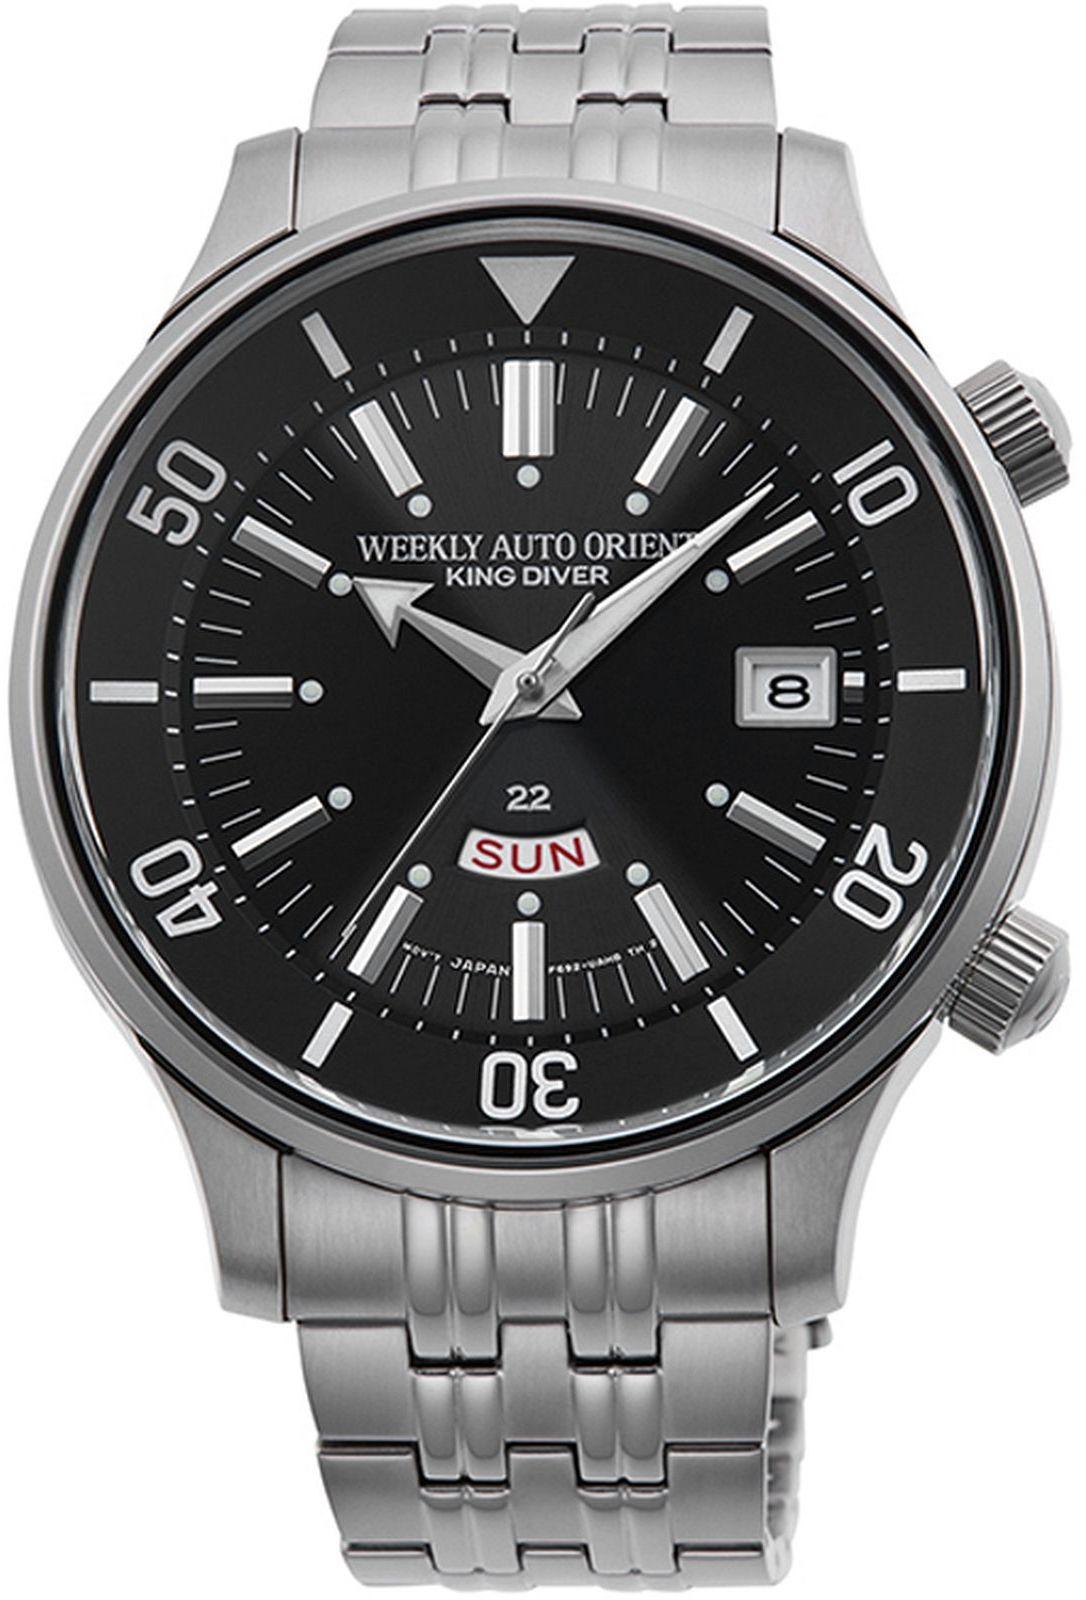 Zegarek męski Orient King Diver 70th Anniversary Automatic